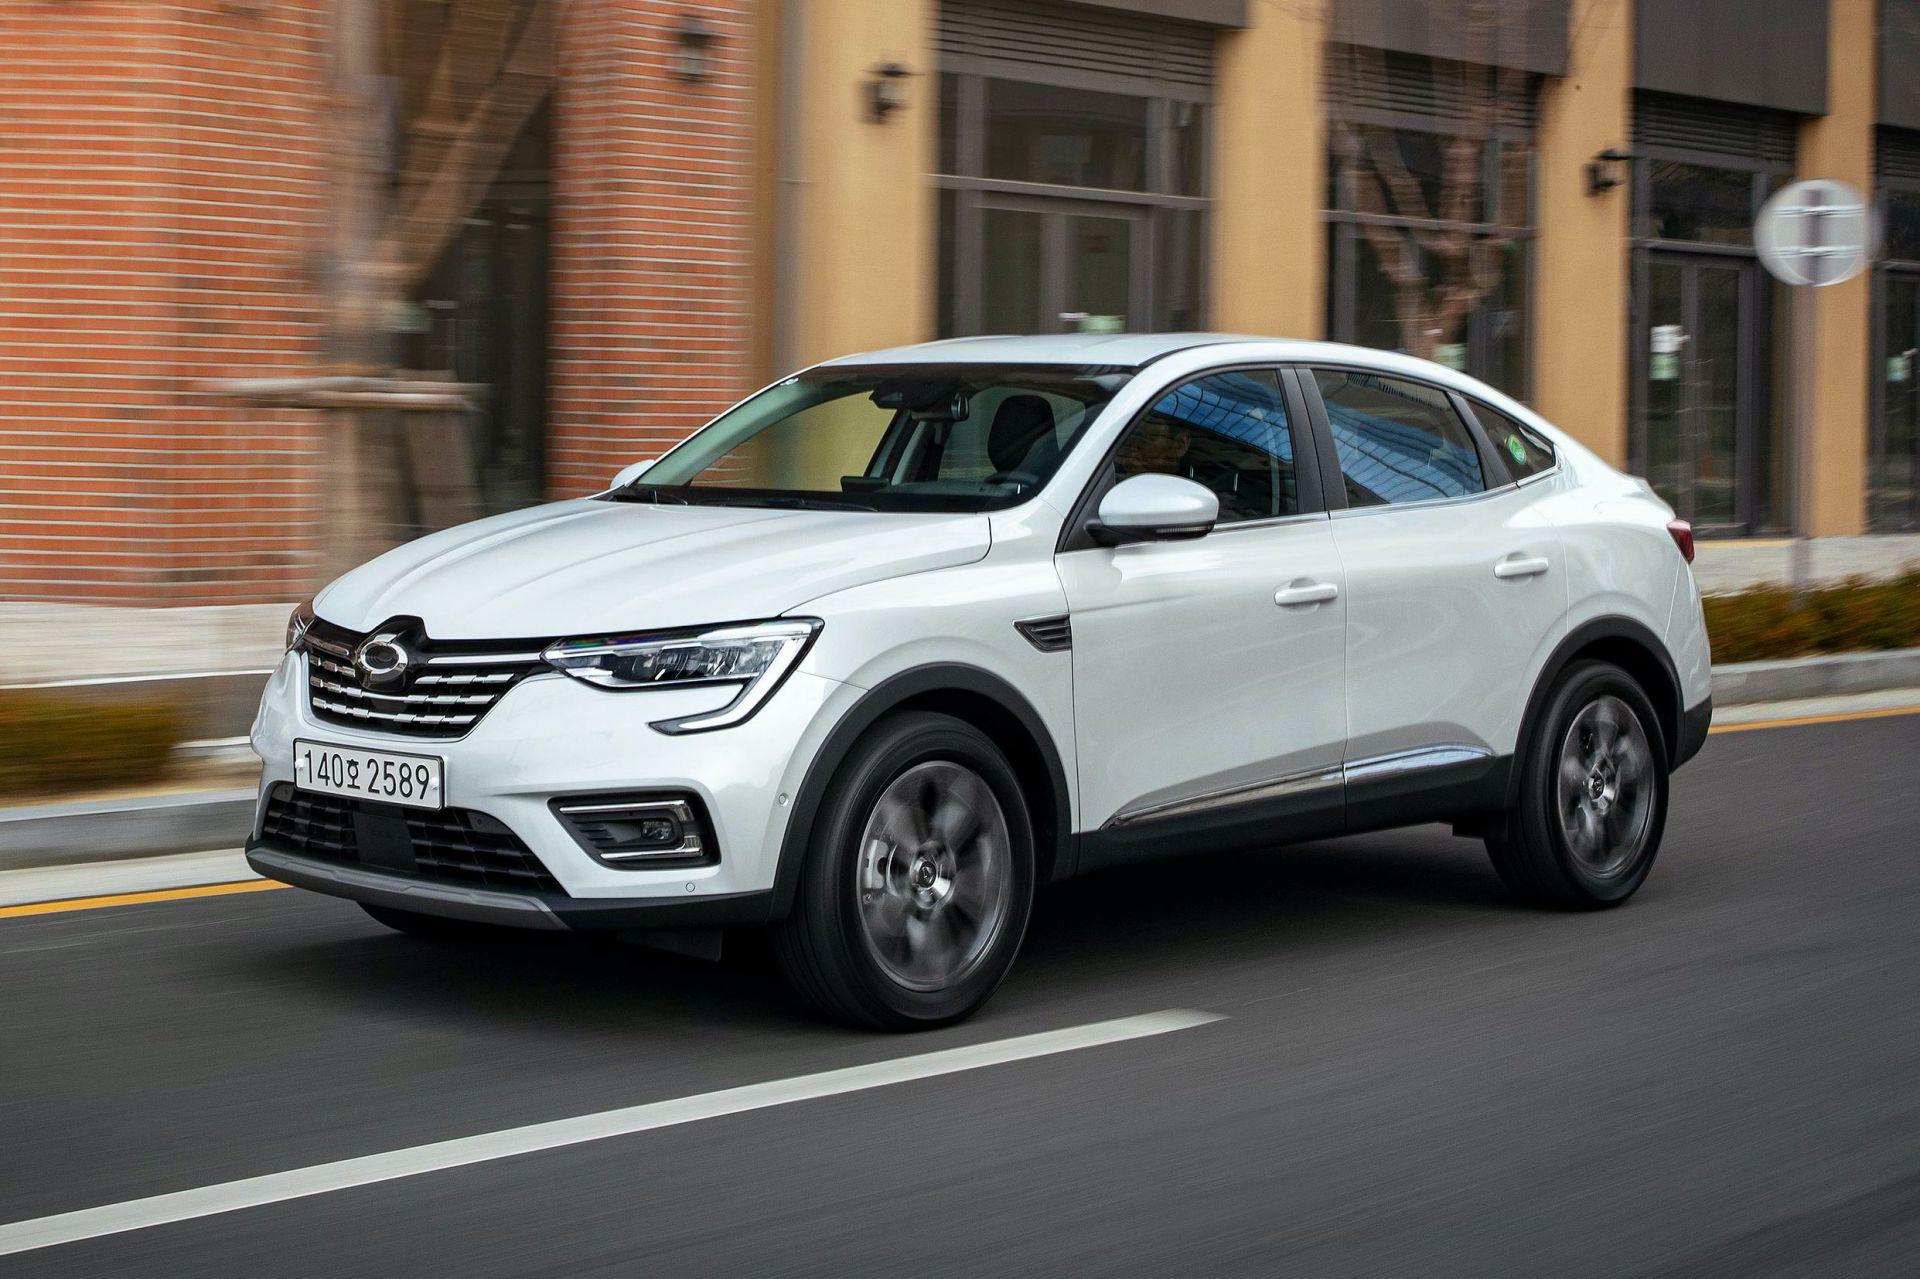 Renault_Samsung_XM3_0009